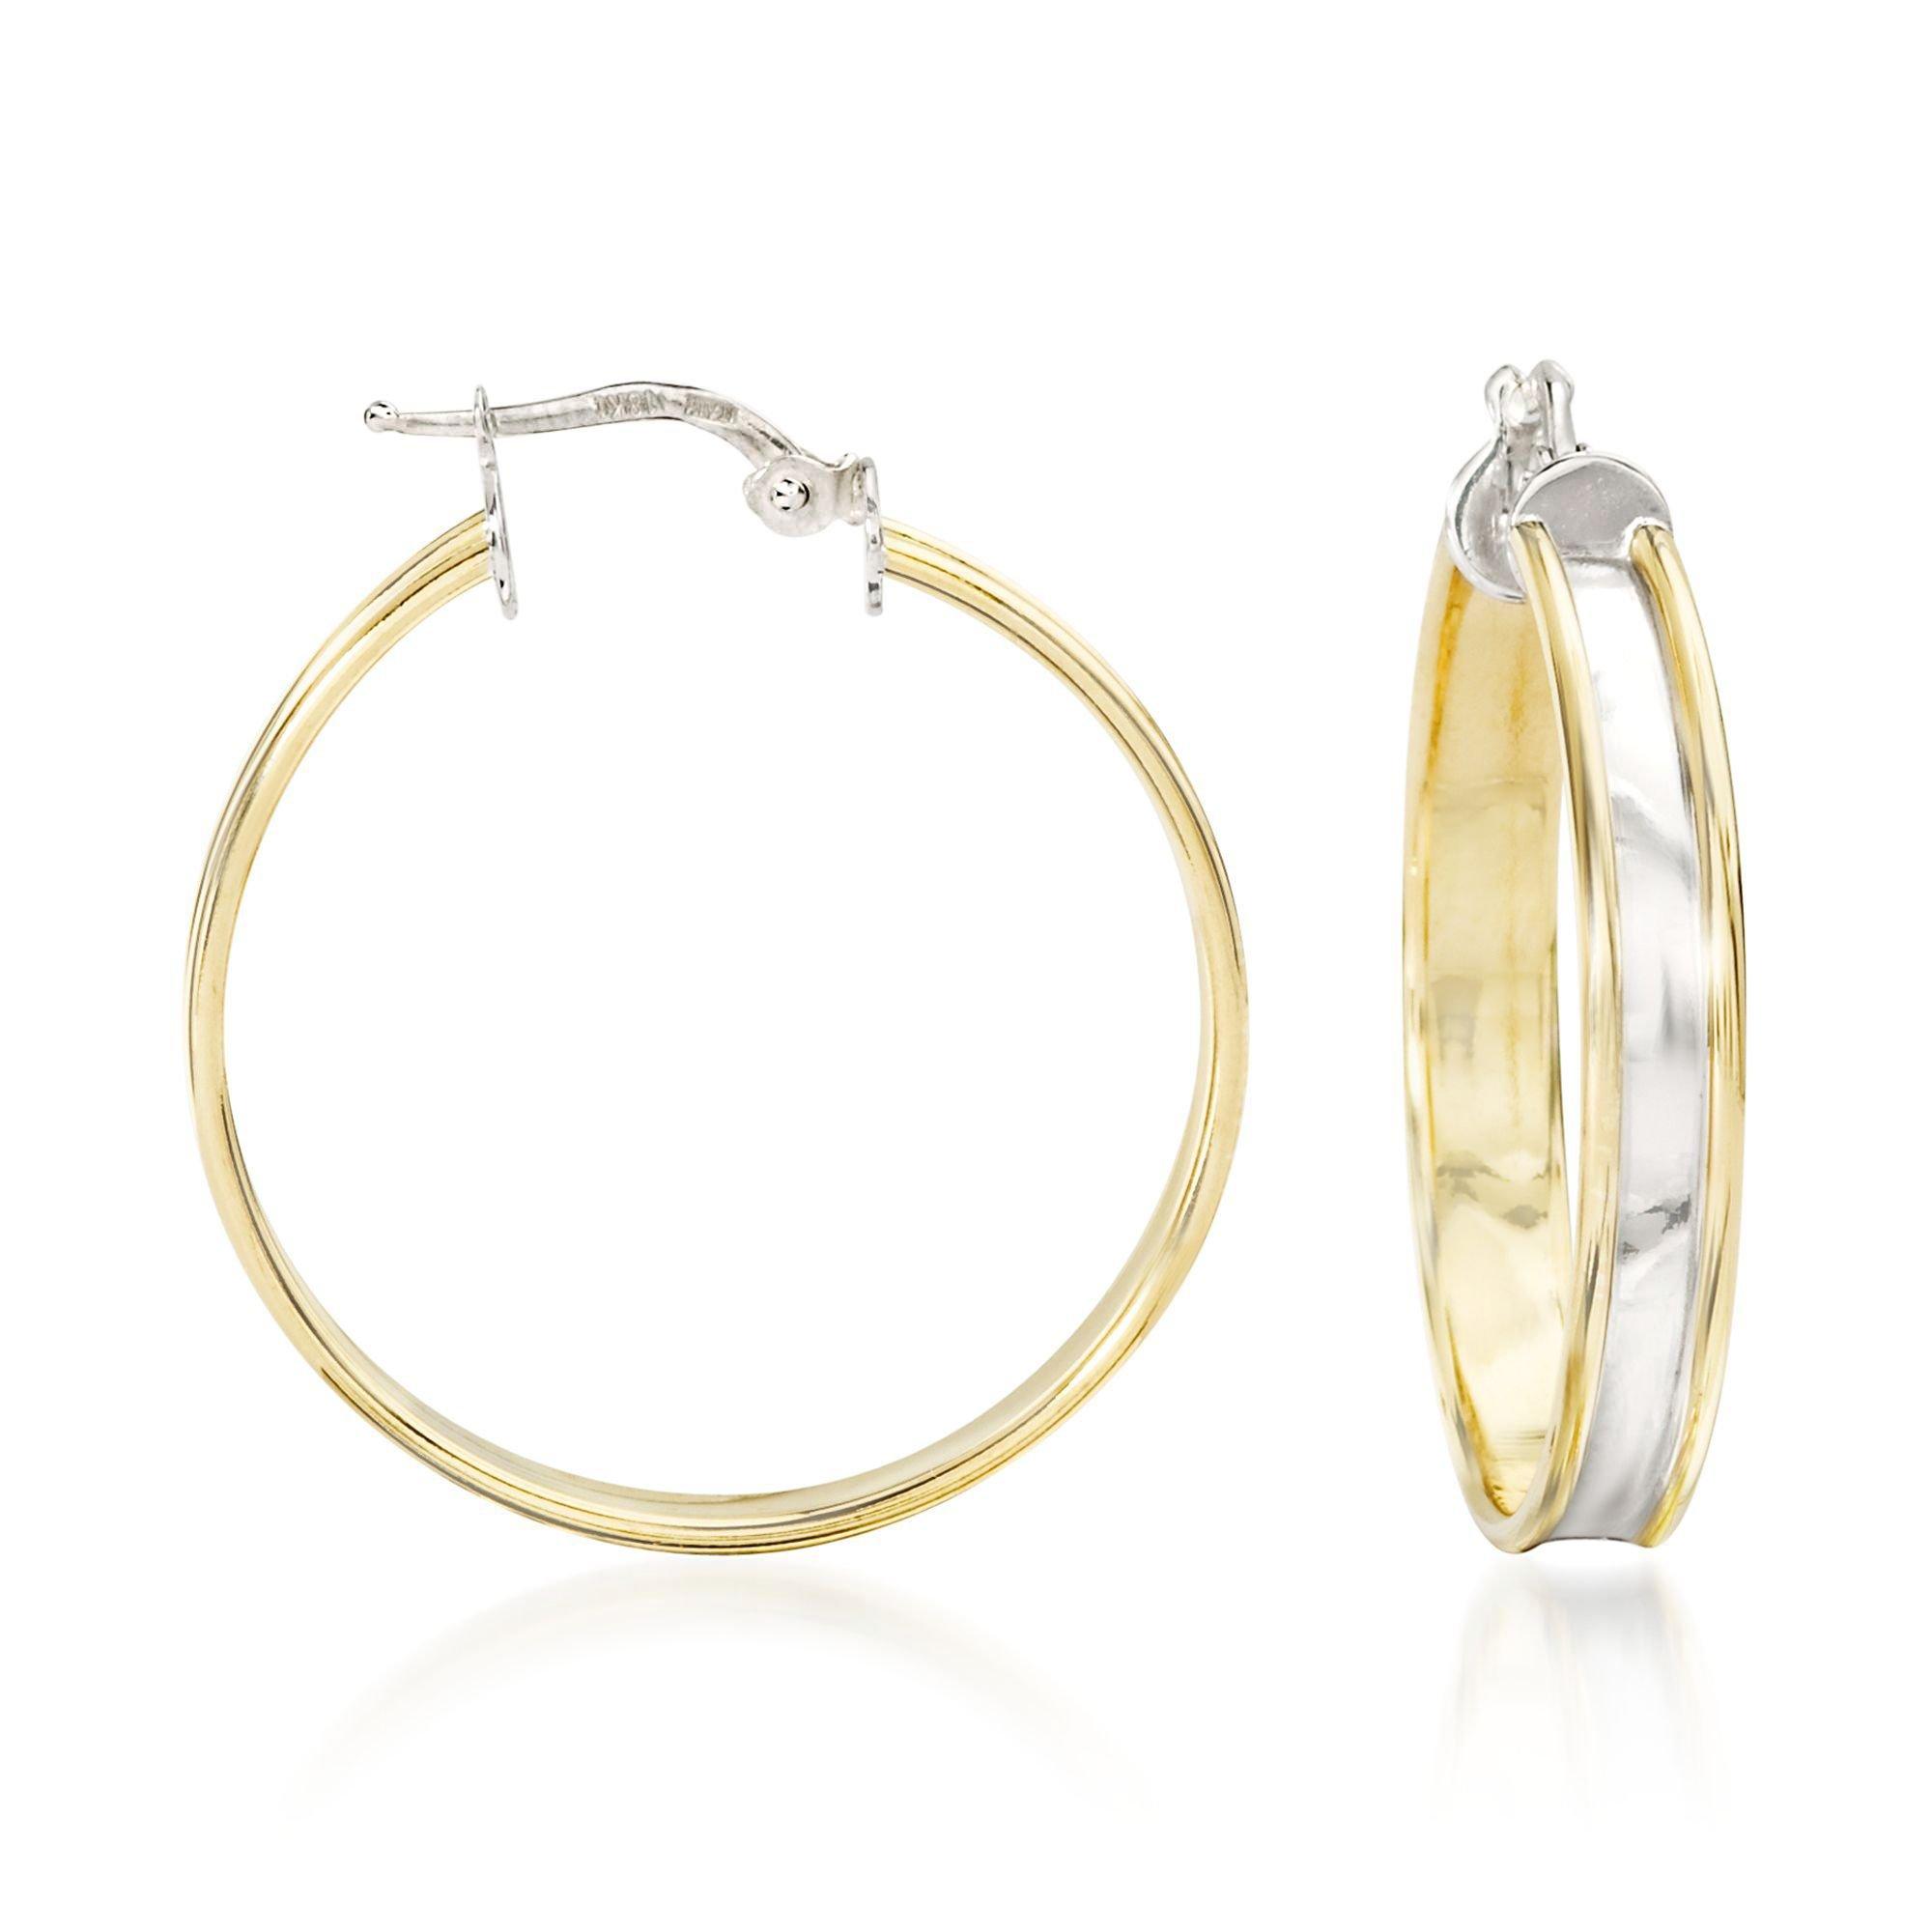 Ross-Simons Italian 18kt Yellow Gold and Sterling Silver Hoop Earrings